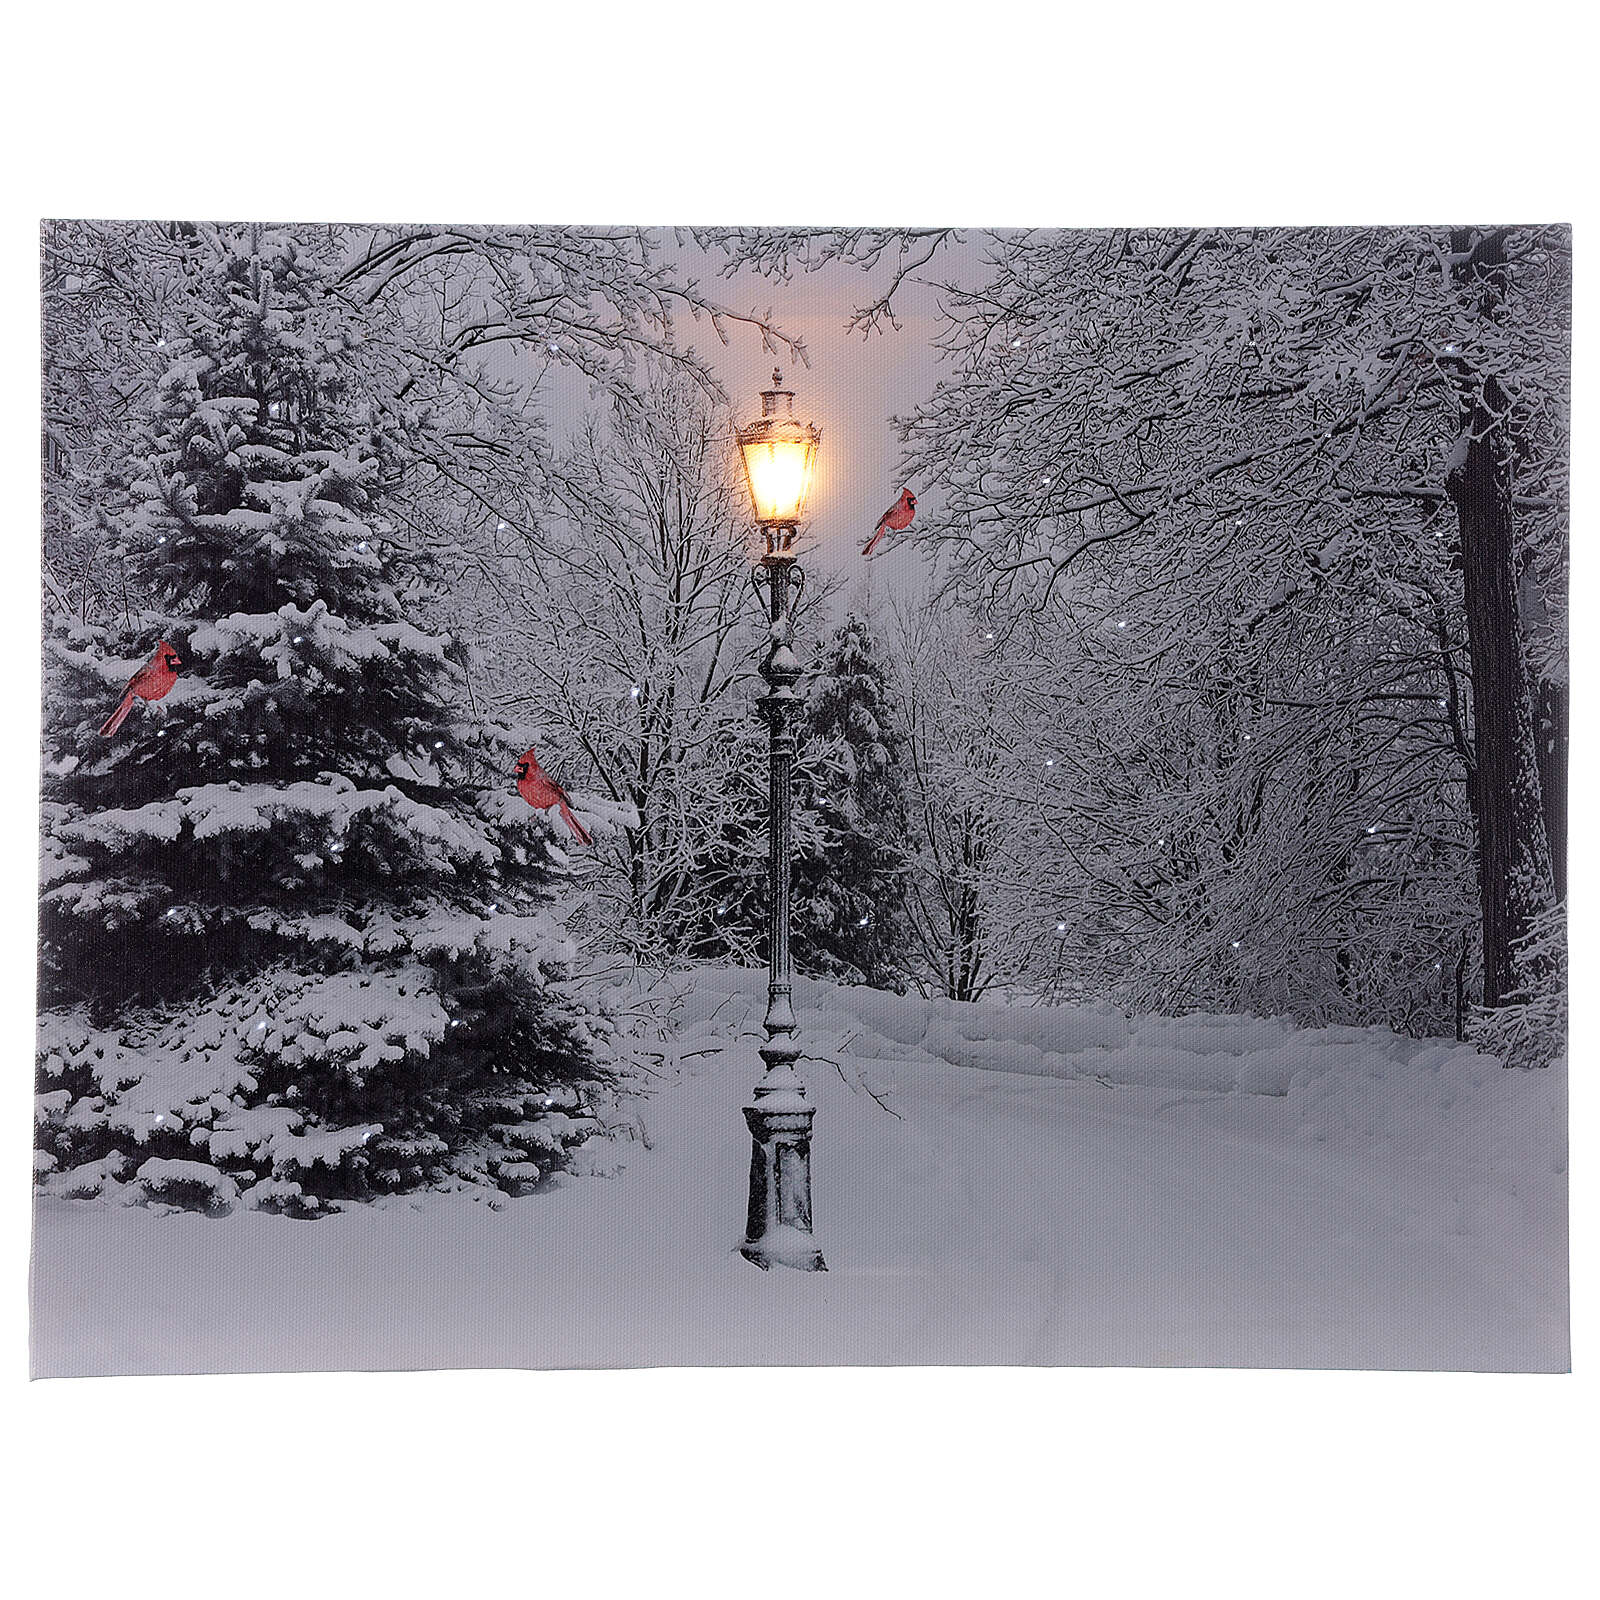 Cuadro luminoso fibra óptica paisaje nevado blanco negro 30x40 cm 3